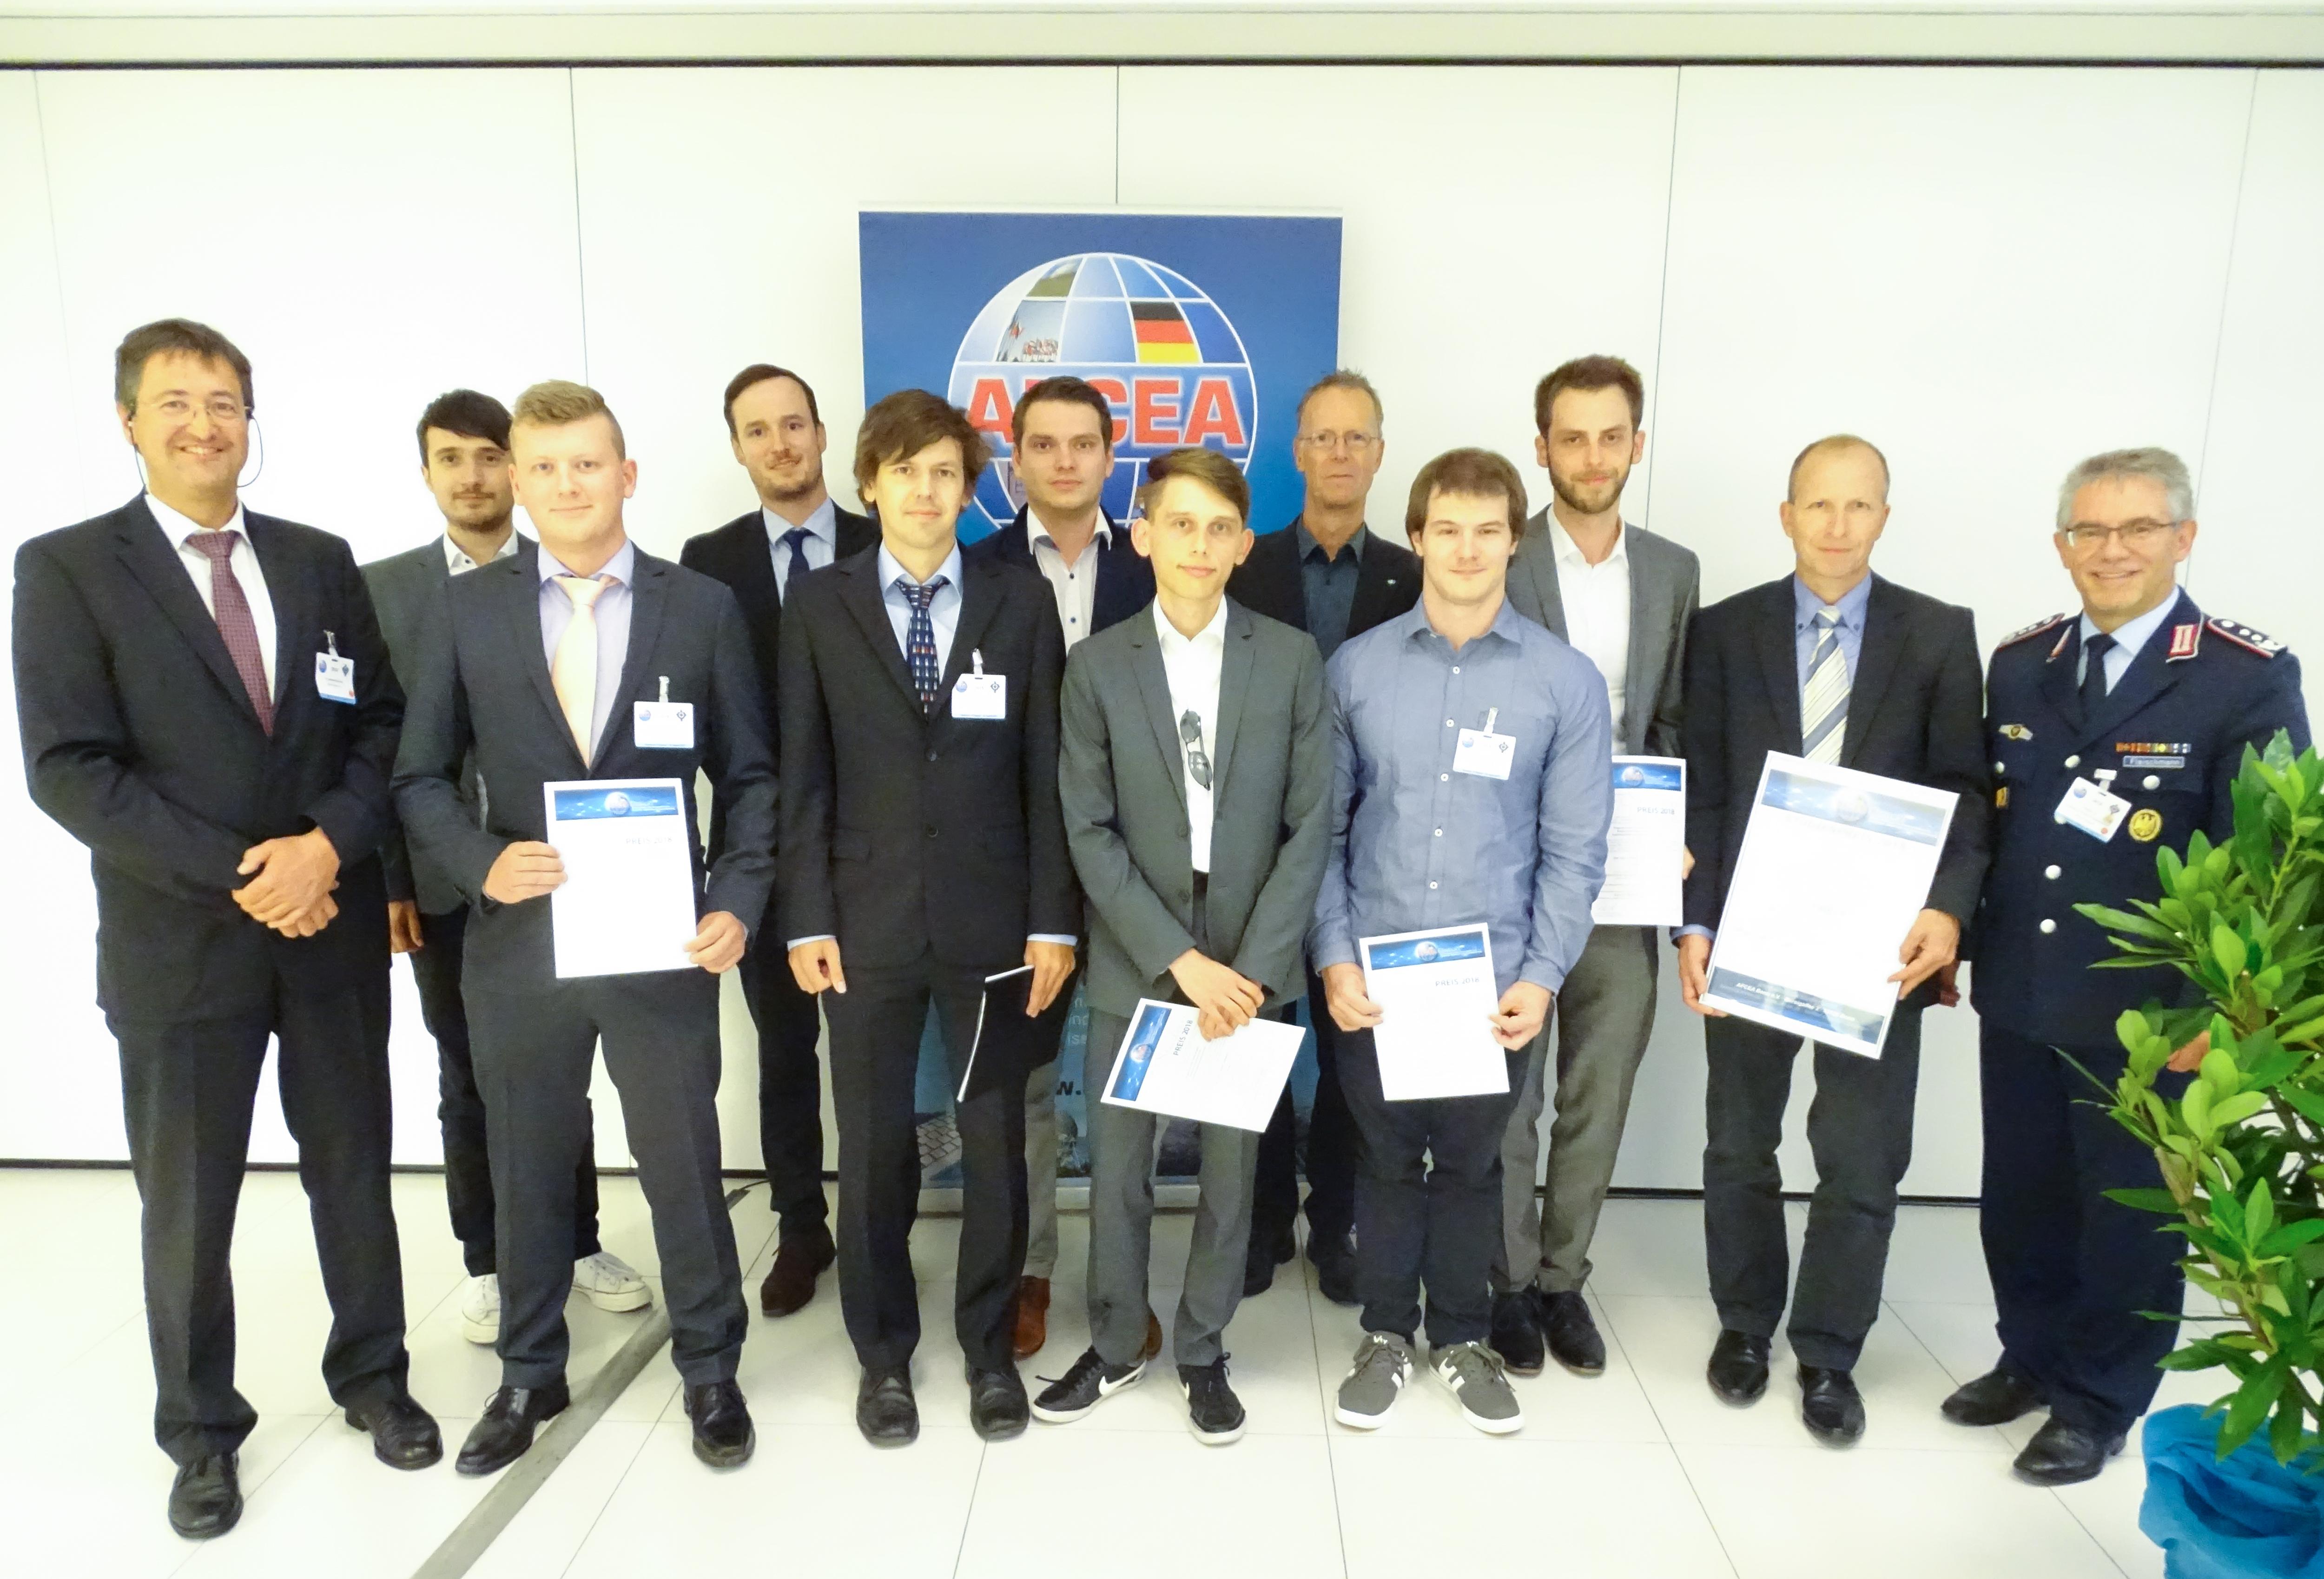 AFCEA Studienpreis: Fünf herausragende Arbeiten - AFCEA Bonn e.V.